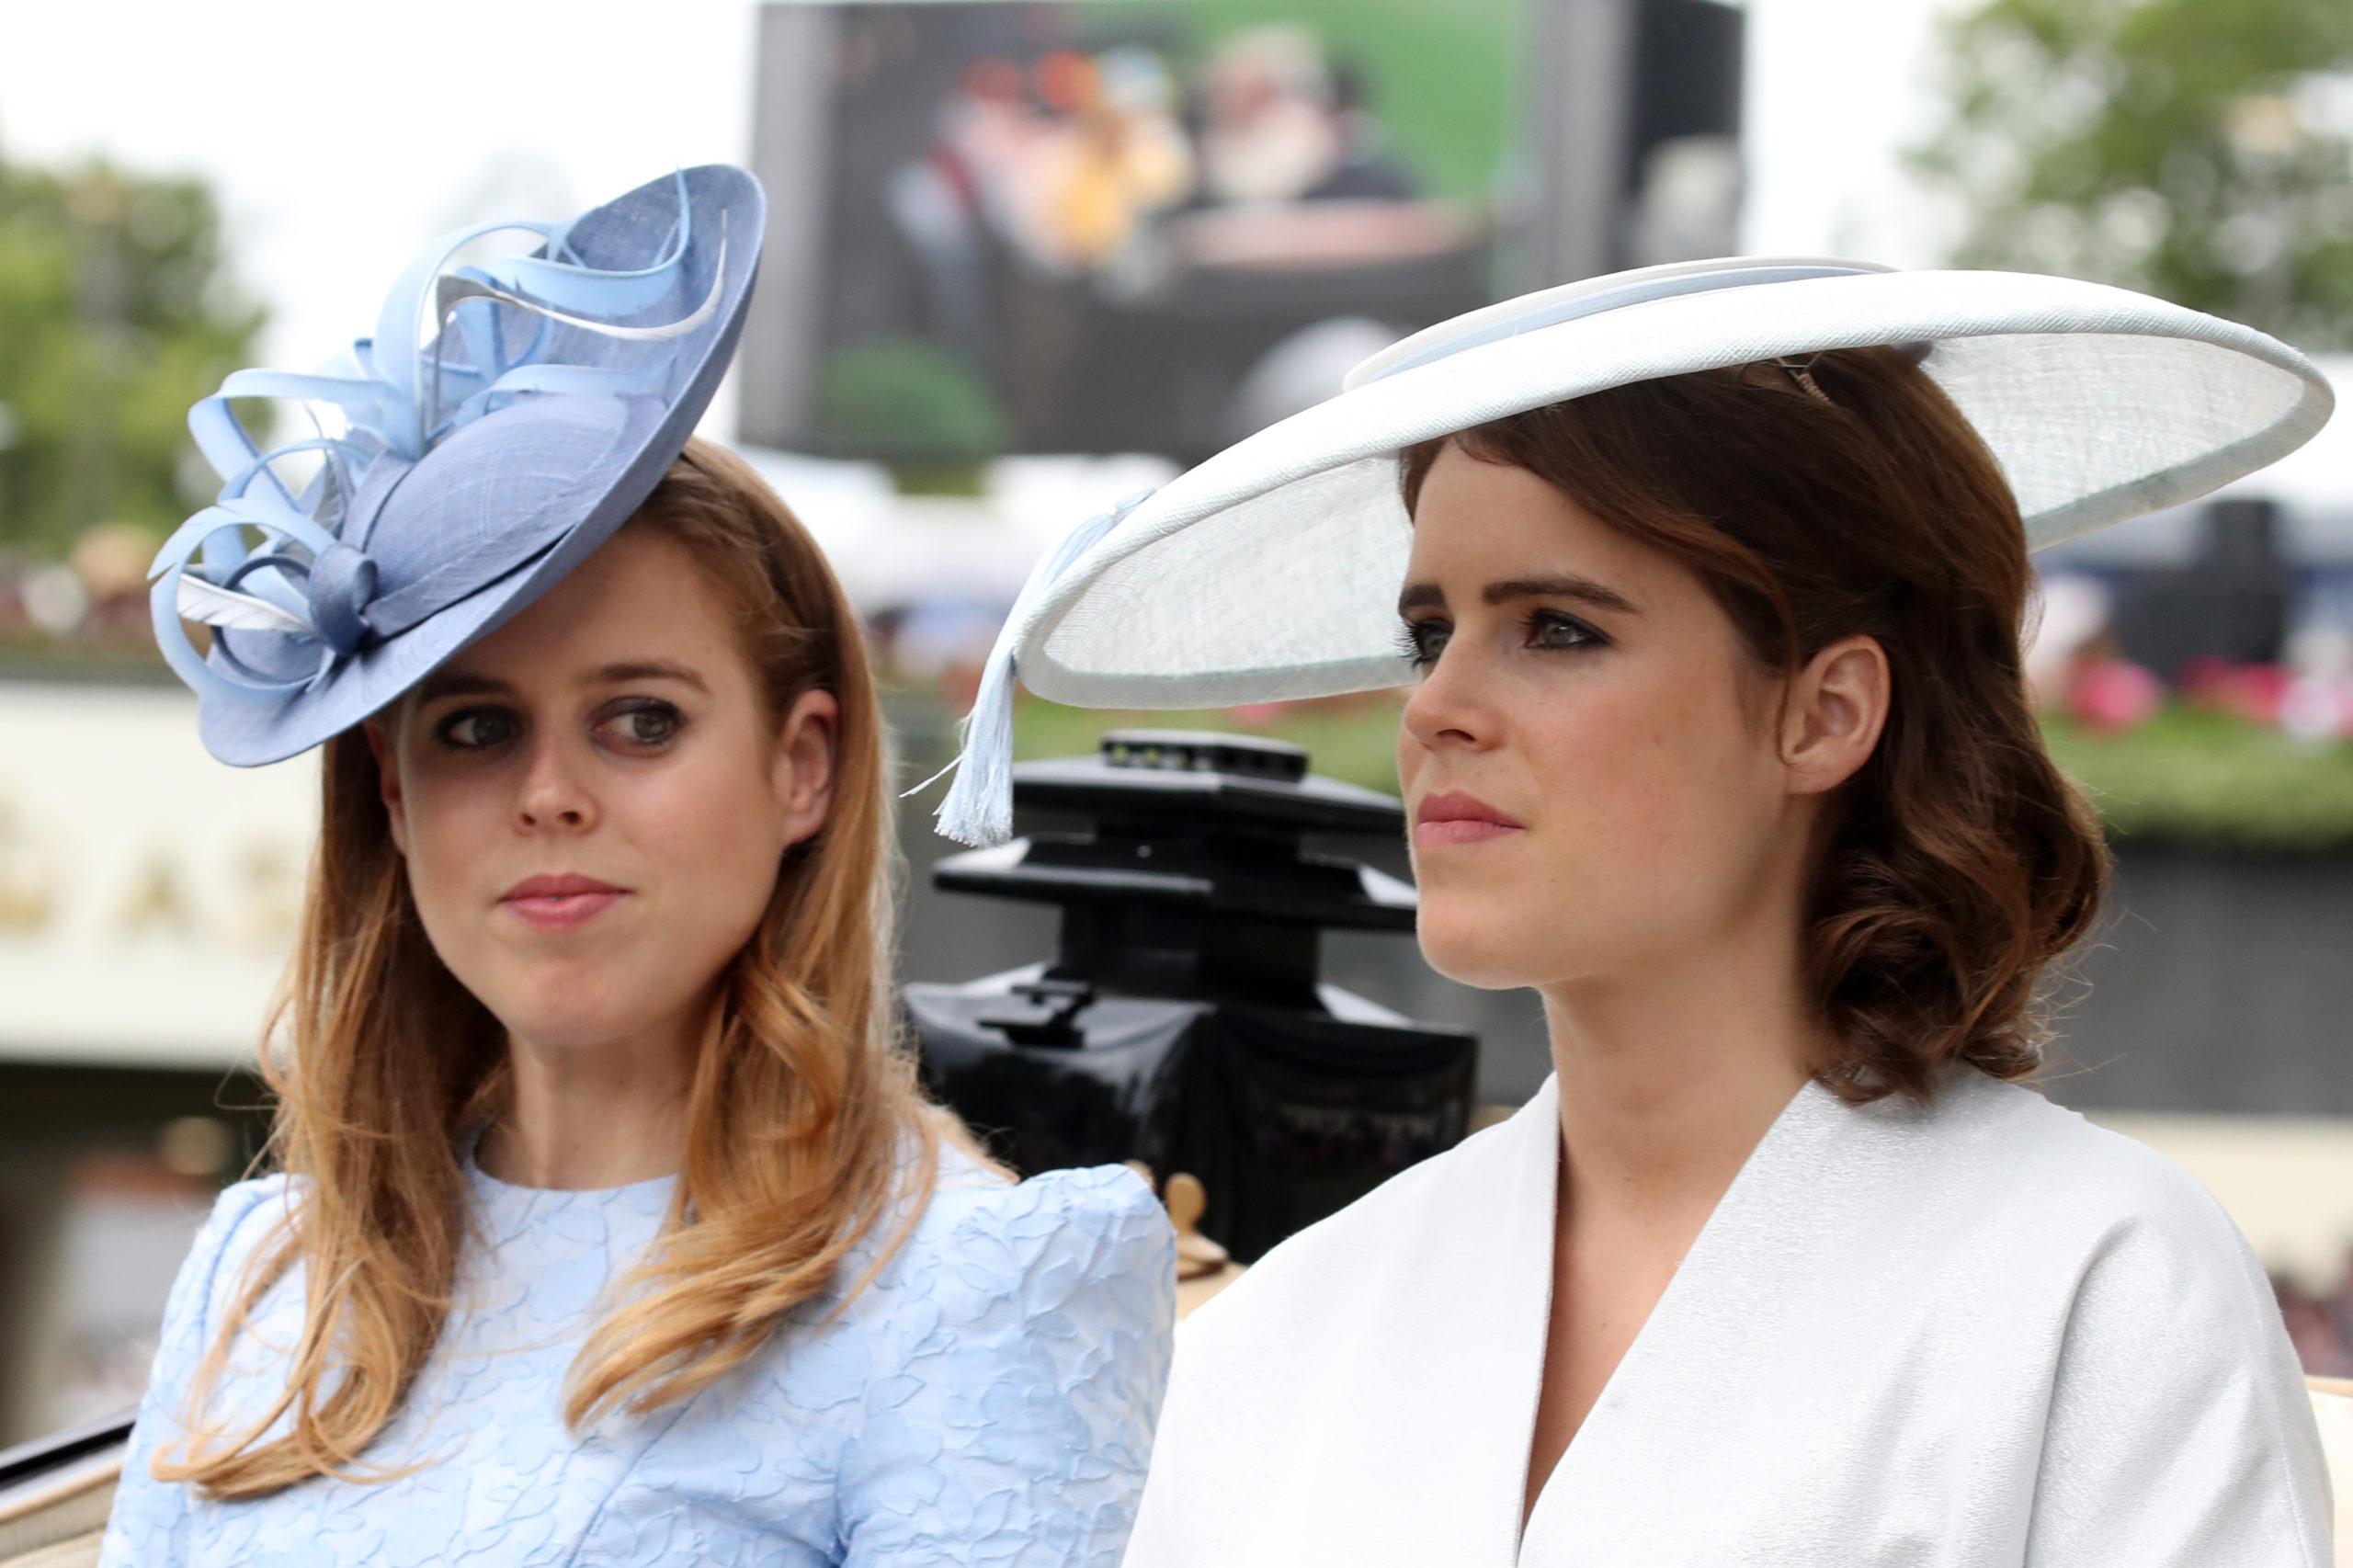 Regina Elisabetta: Beatrice e Eugenie sostituiranno Meghan Markle e Harry